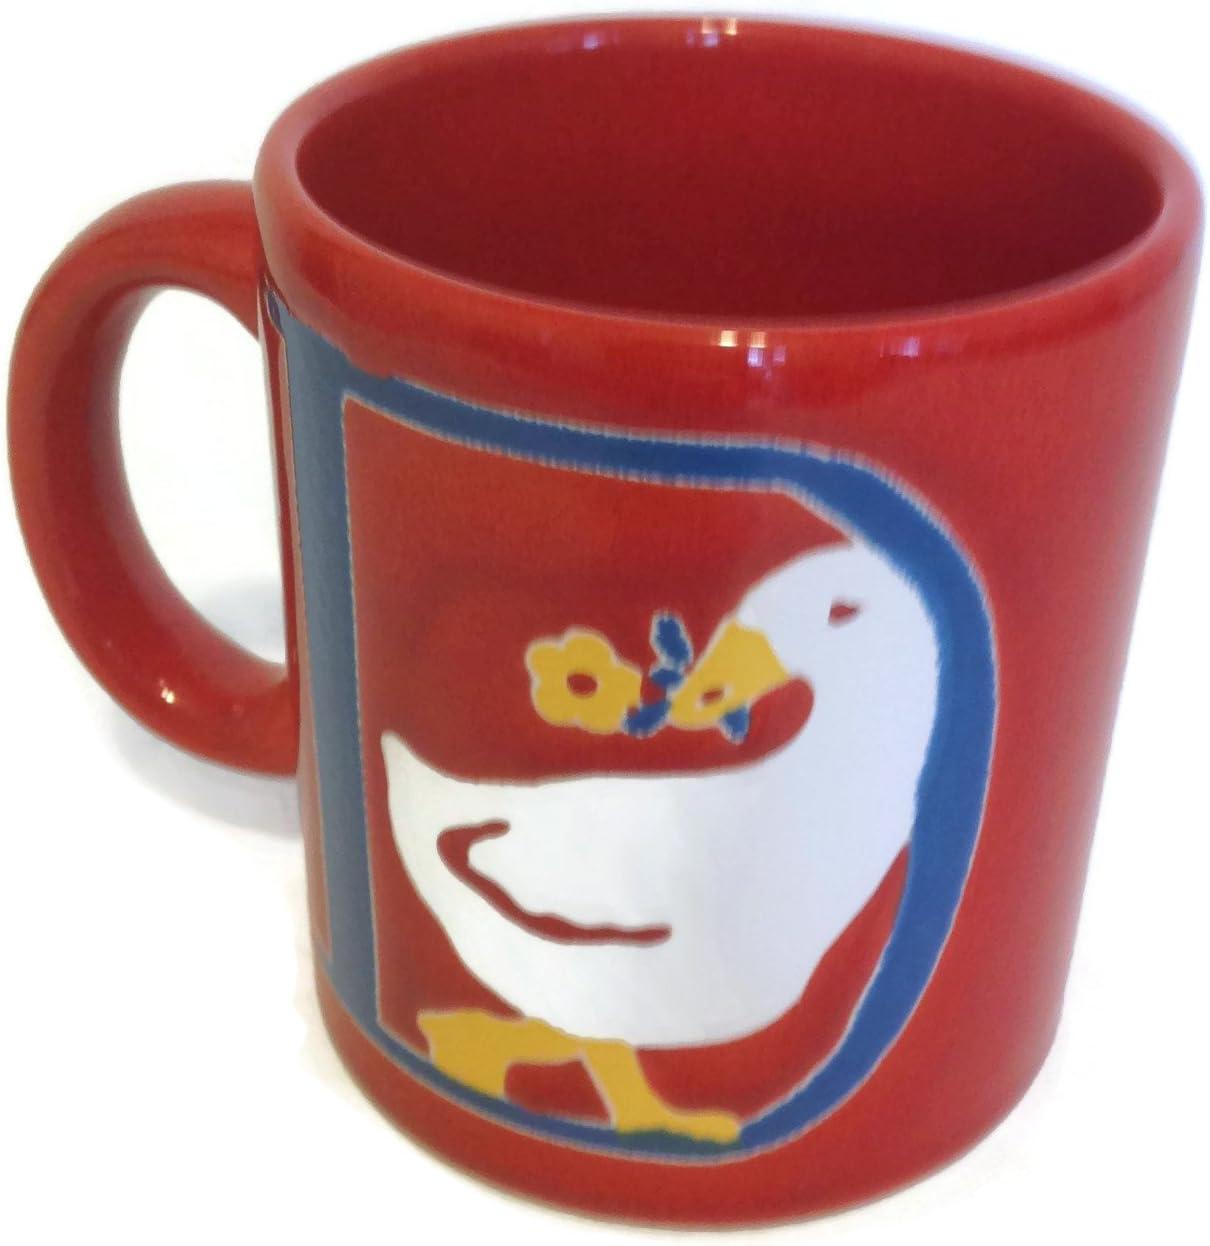 Taza de café Waechtersbach Vintage fabricado en España: Amazon.es: Hogar